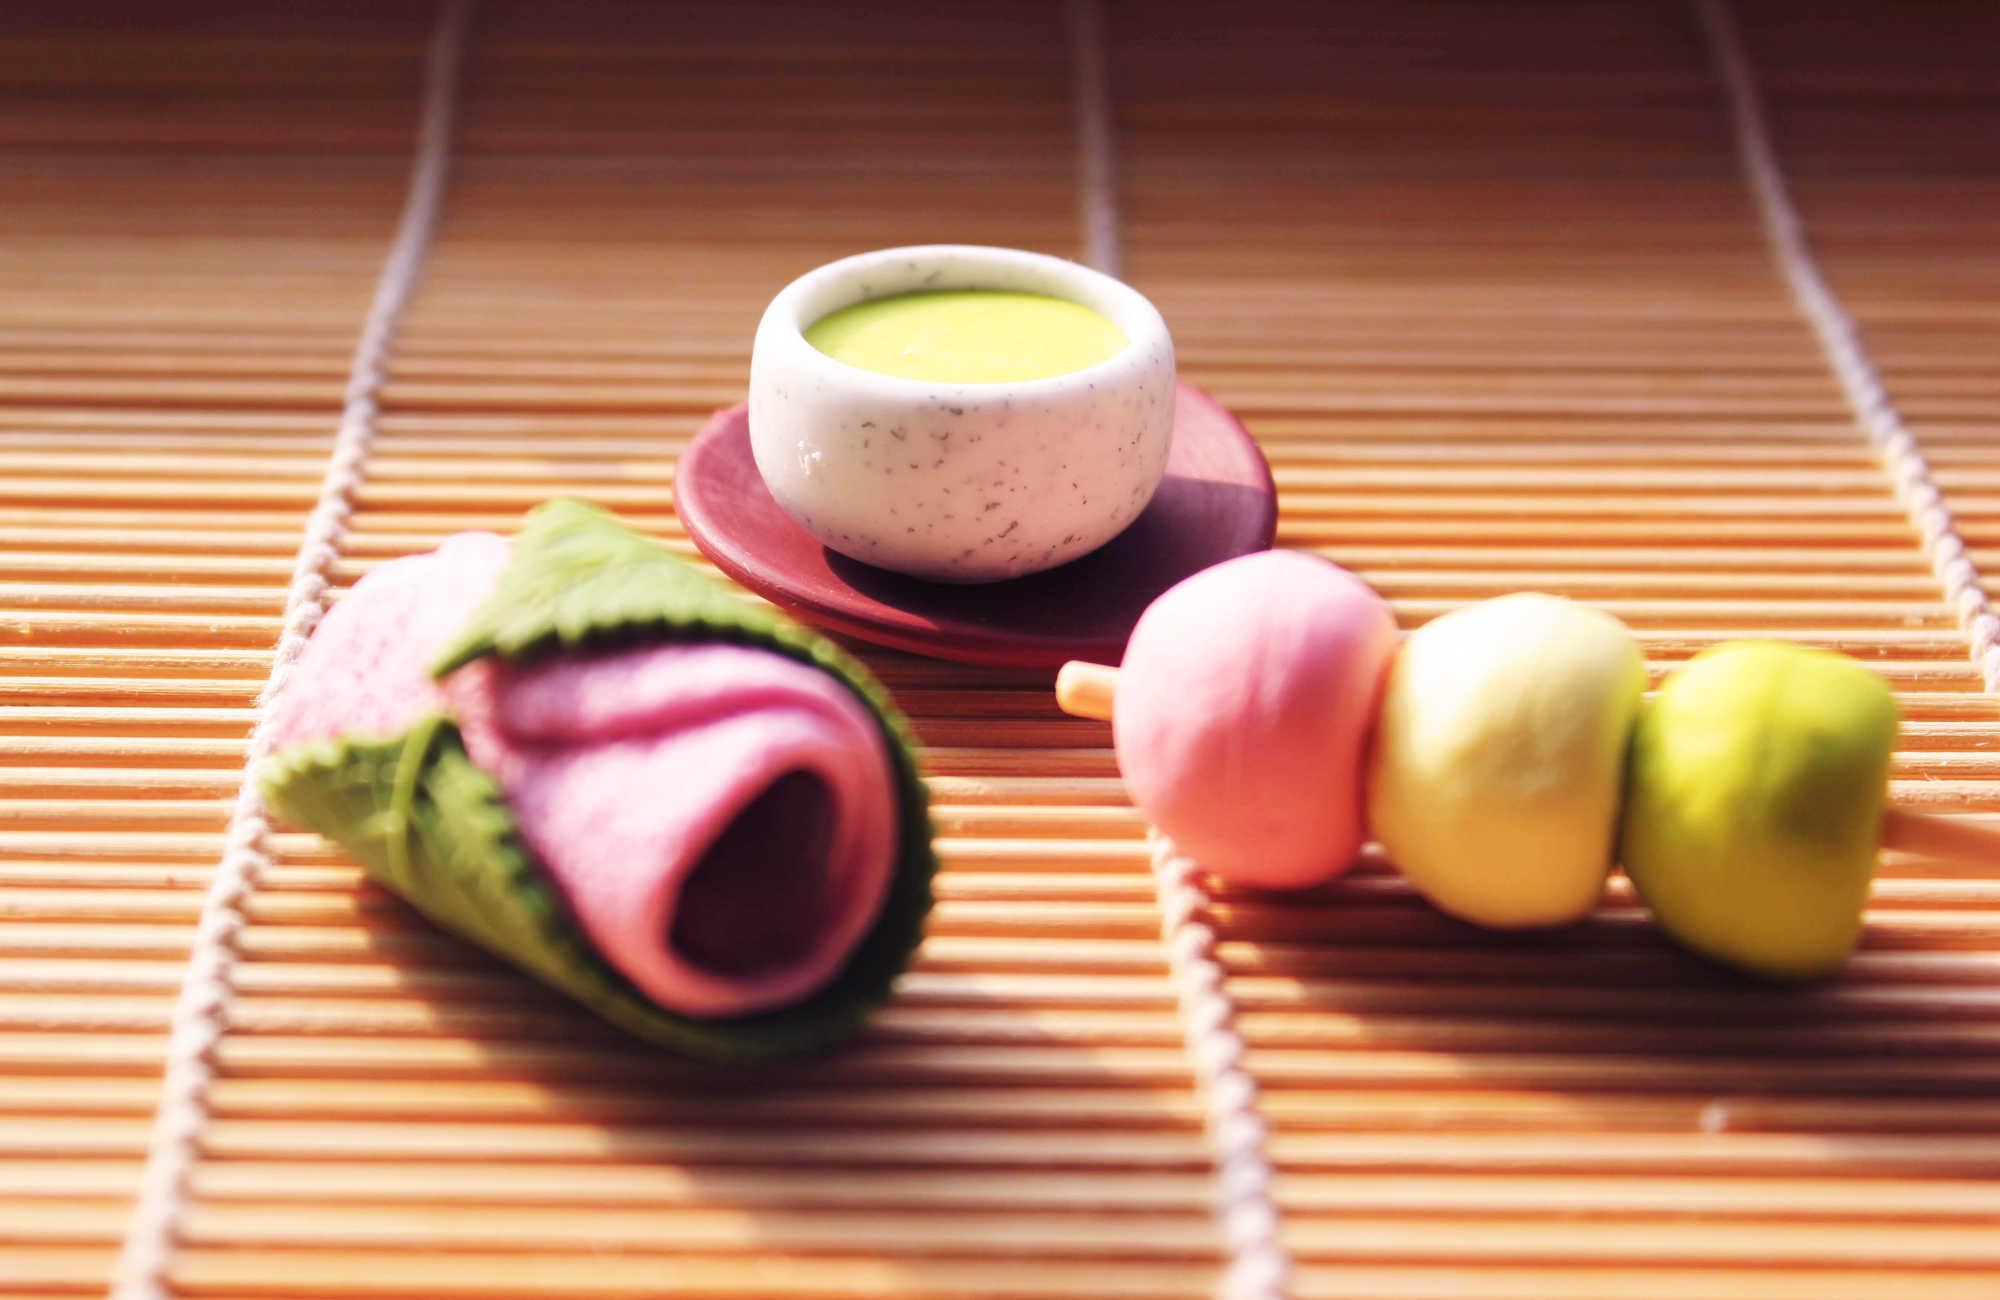 wagashi japonaise : dango, mochi, daifuku et dorayaki au Japon